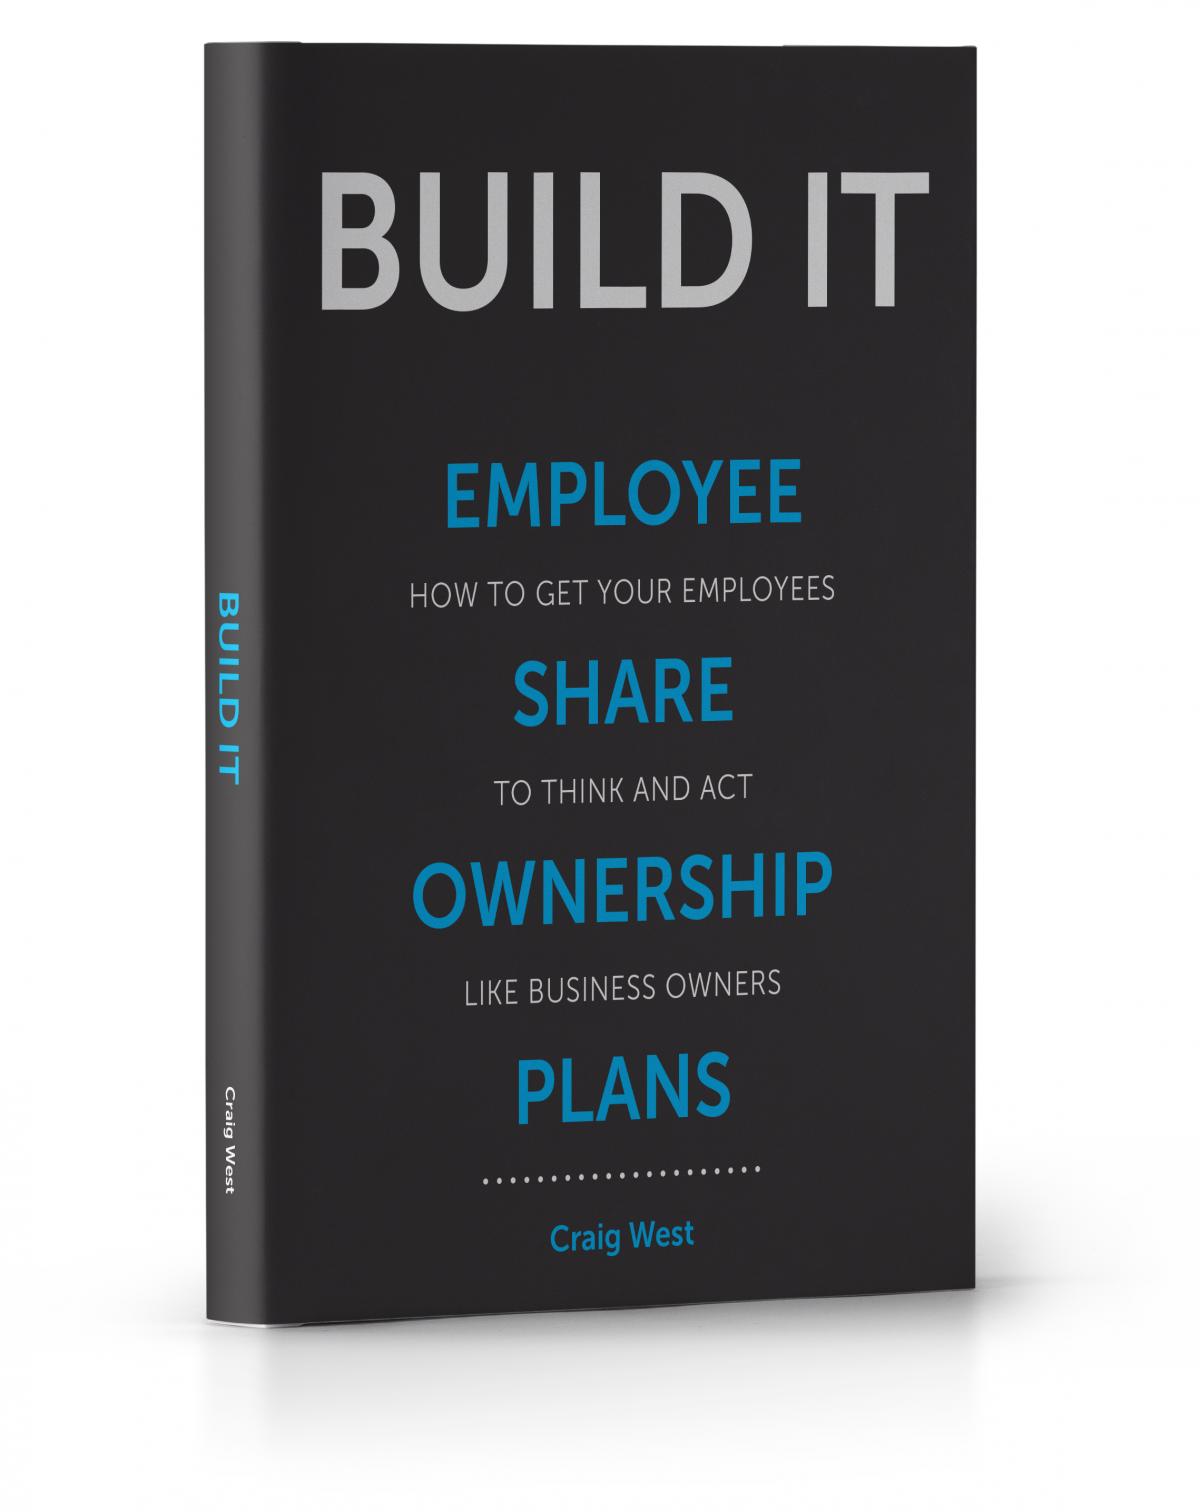 BuildIt-Book-Mockup190320